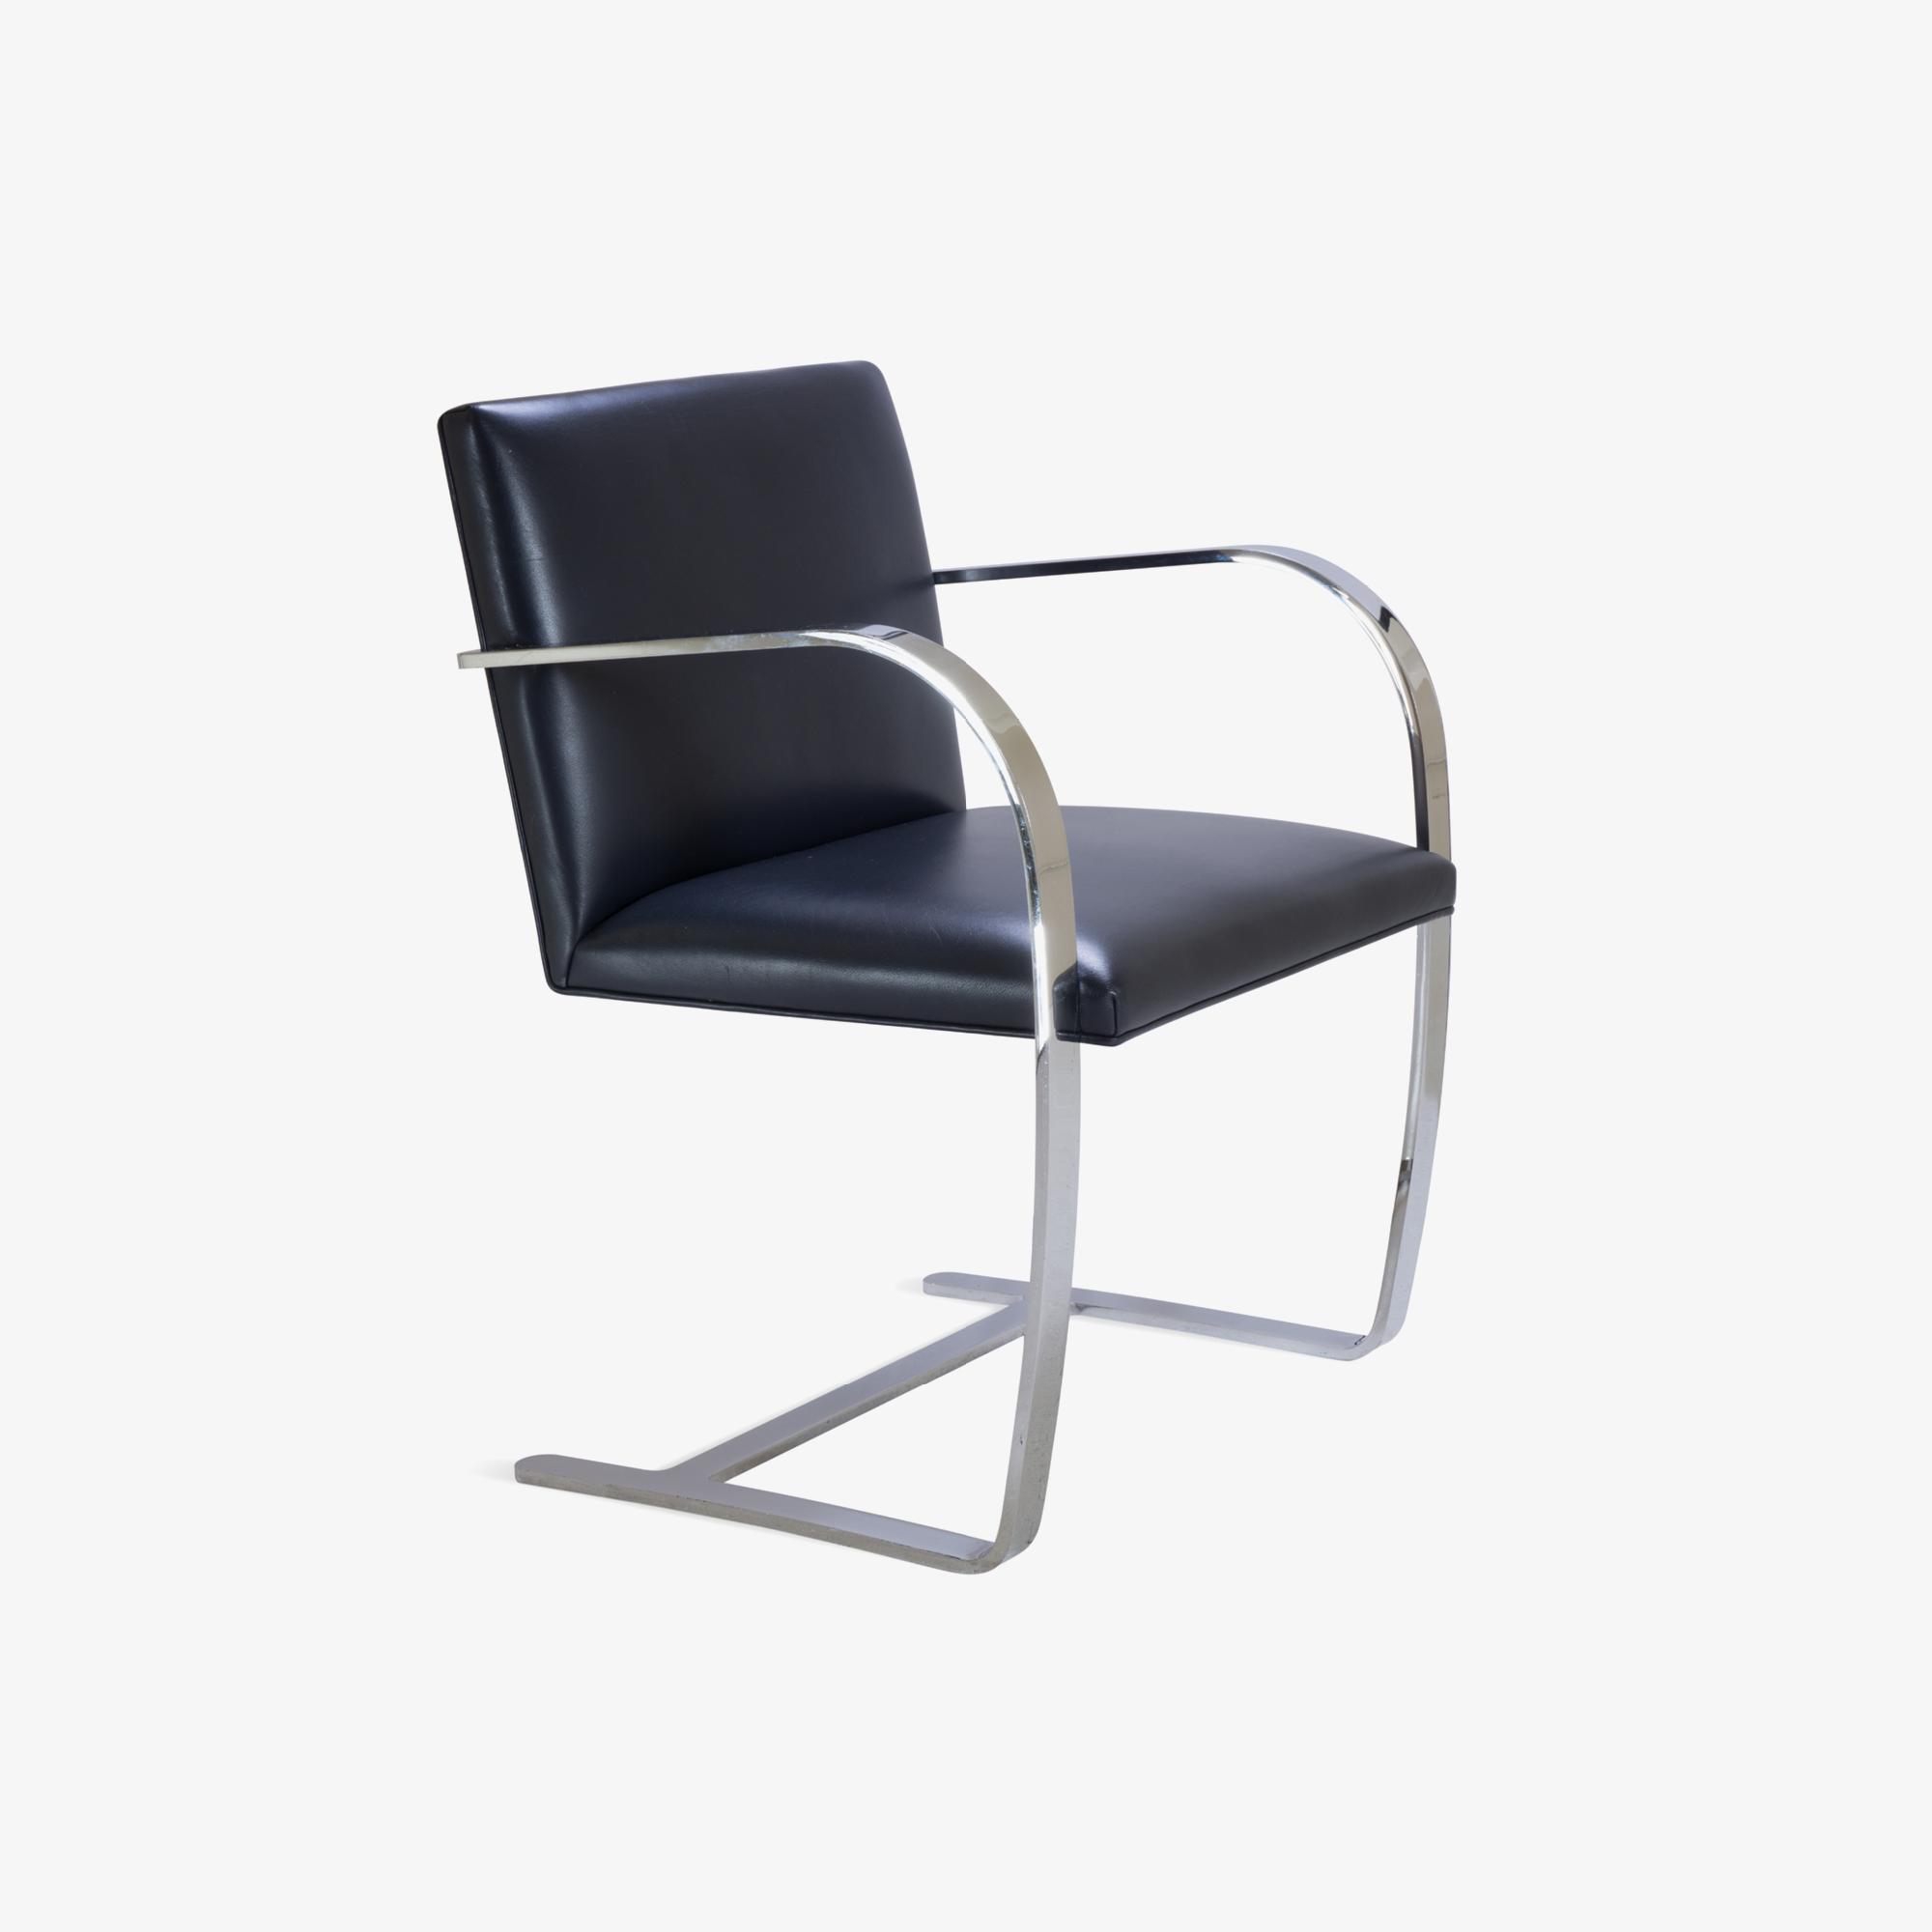 Knoll Brno Flat-Bar Chairs in Navy Velvet